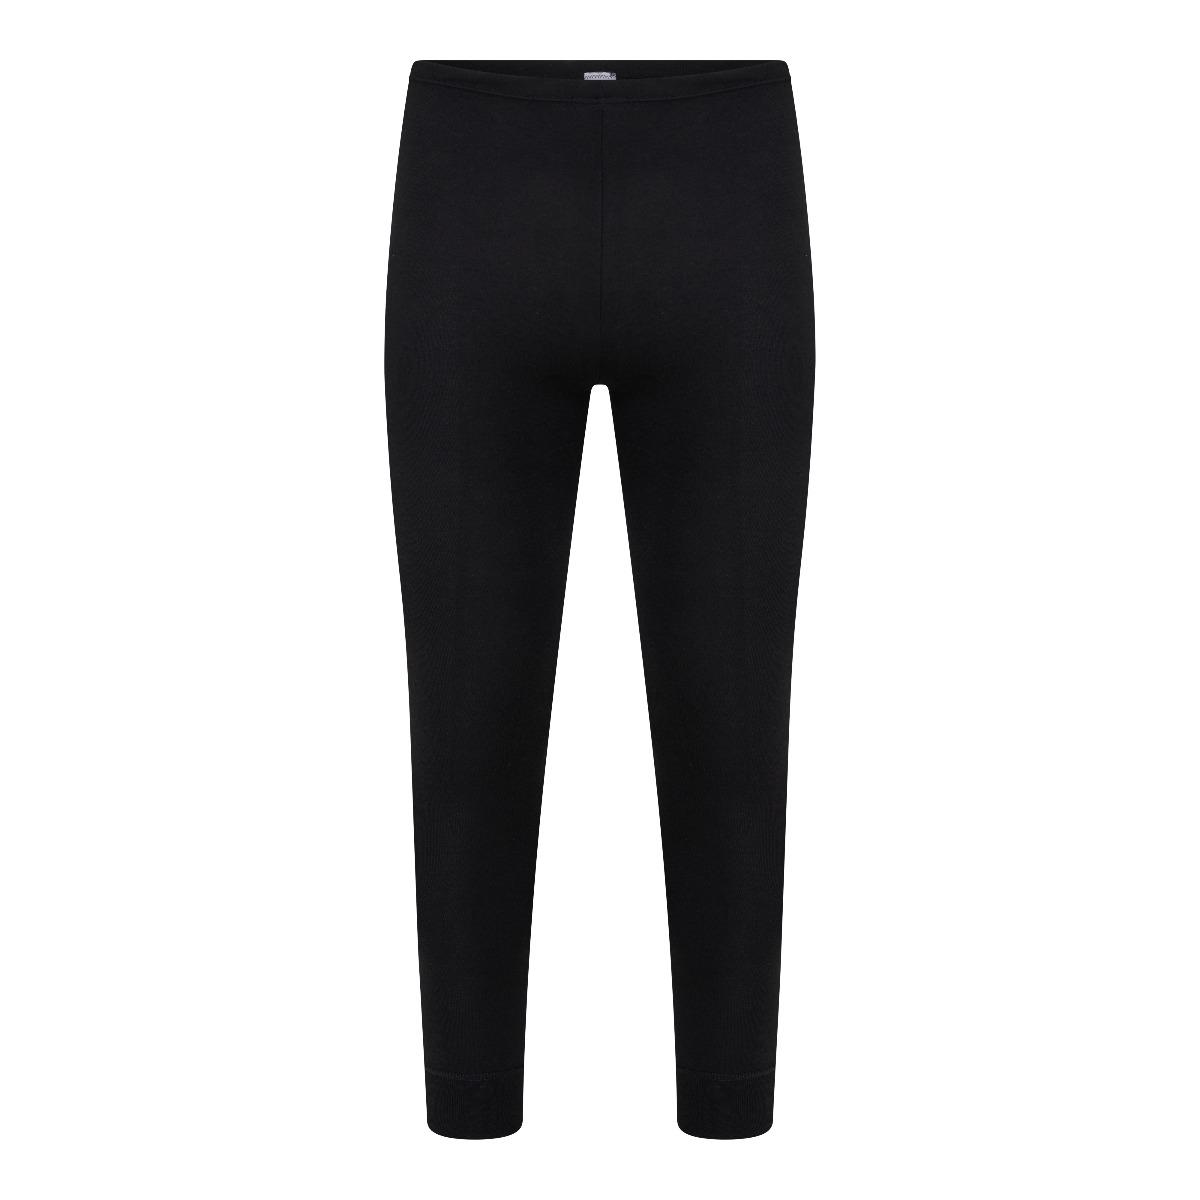 Beeren Thermo Unisex Pantalon Zwart XL